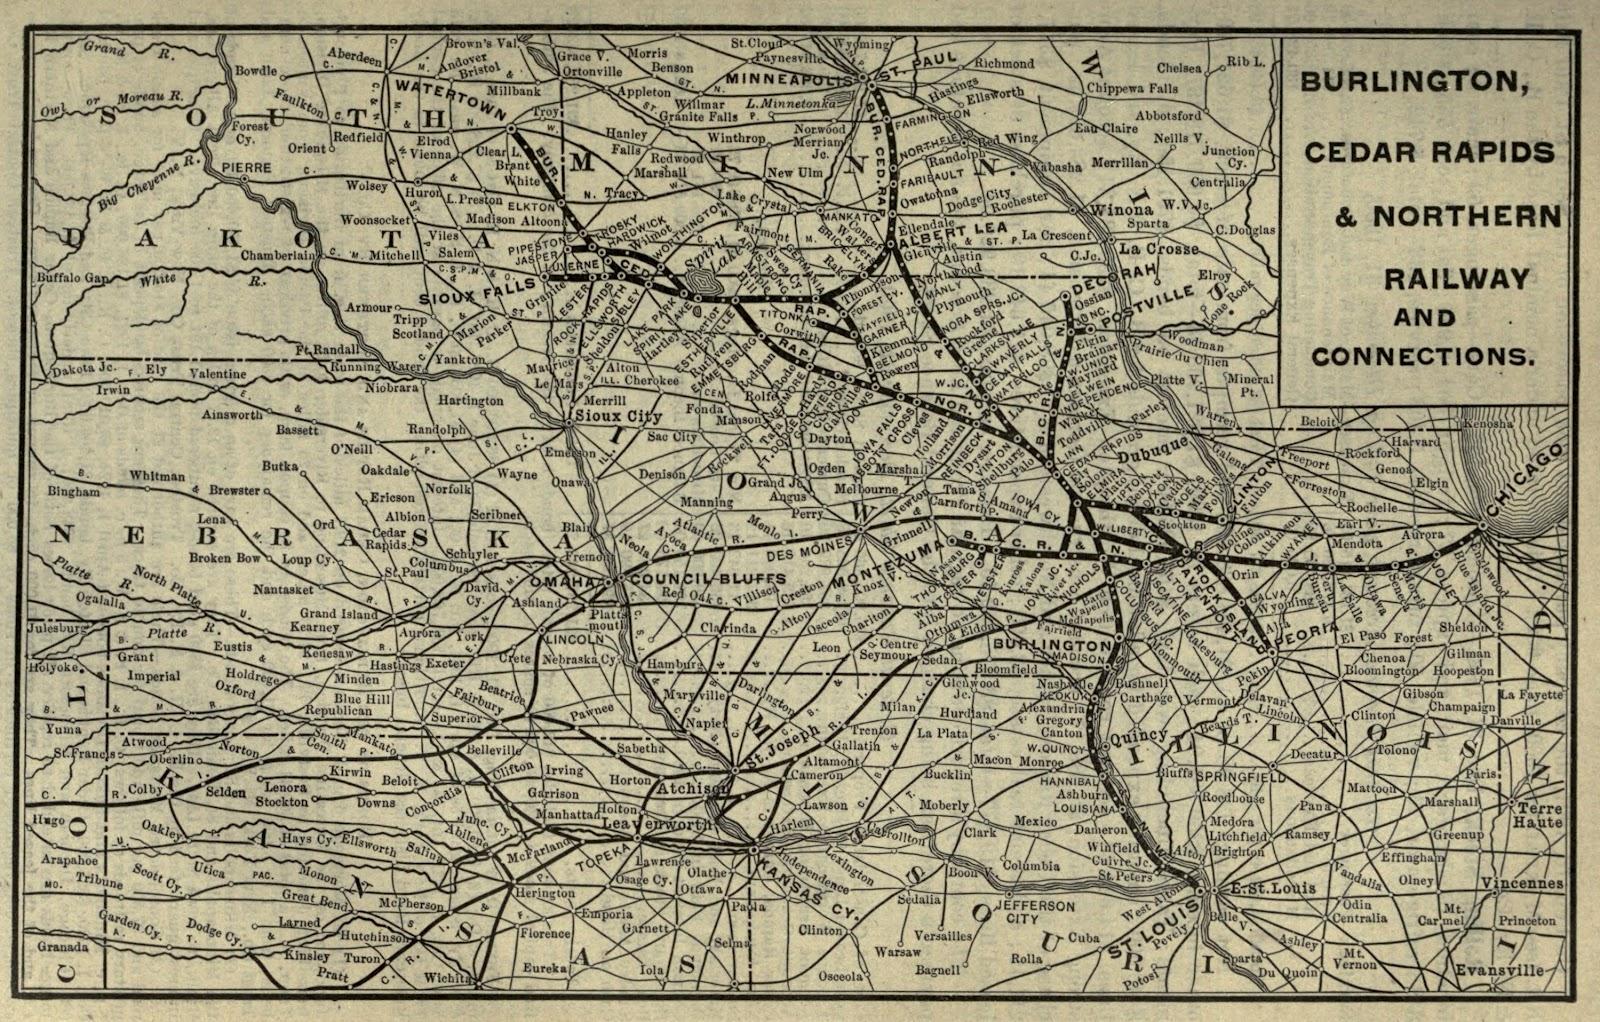 Burlington Cedar Rapids And Northern Railway